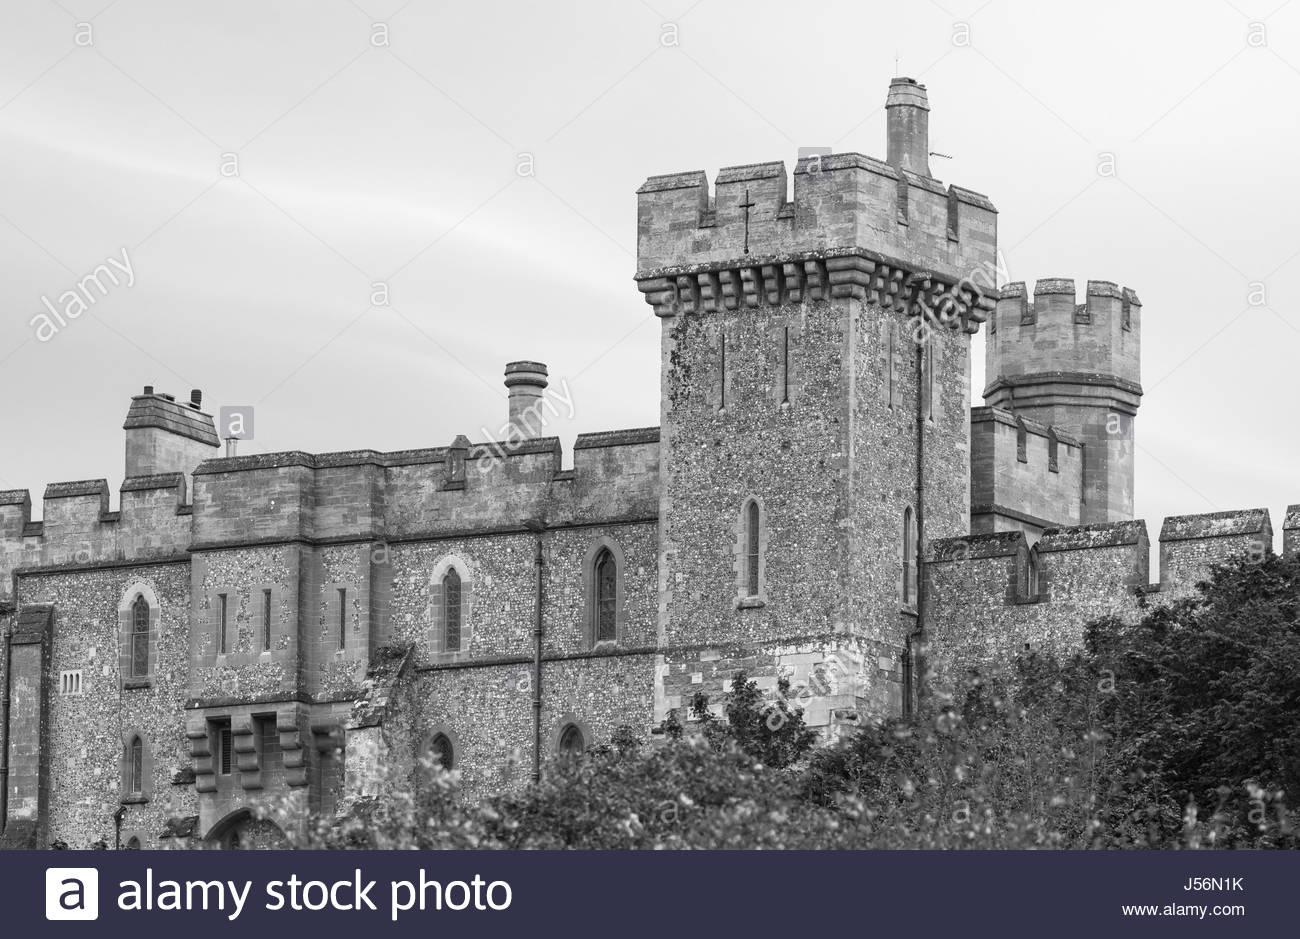 black-and-white-image-of-arundel-castle-